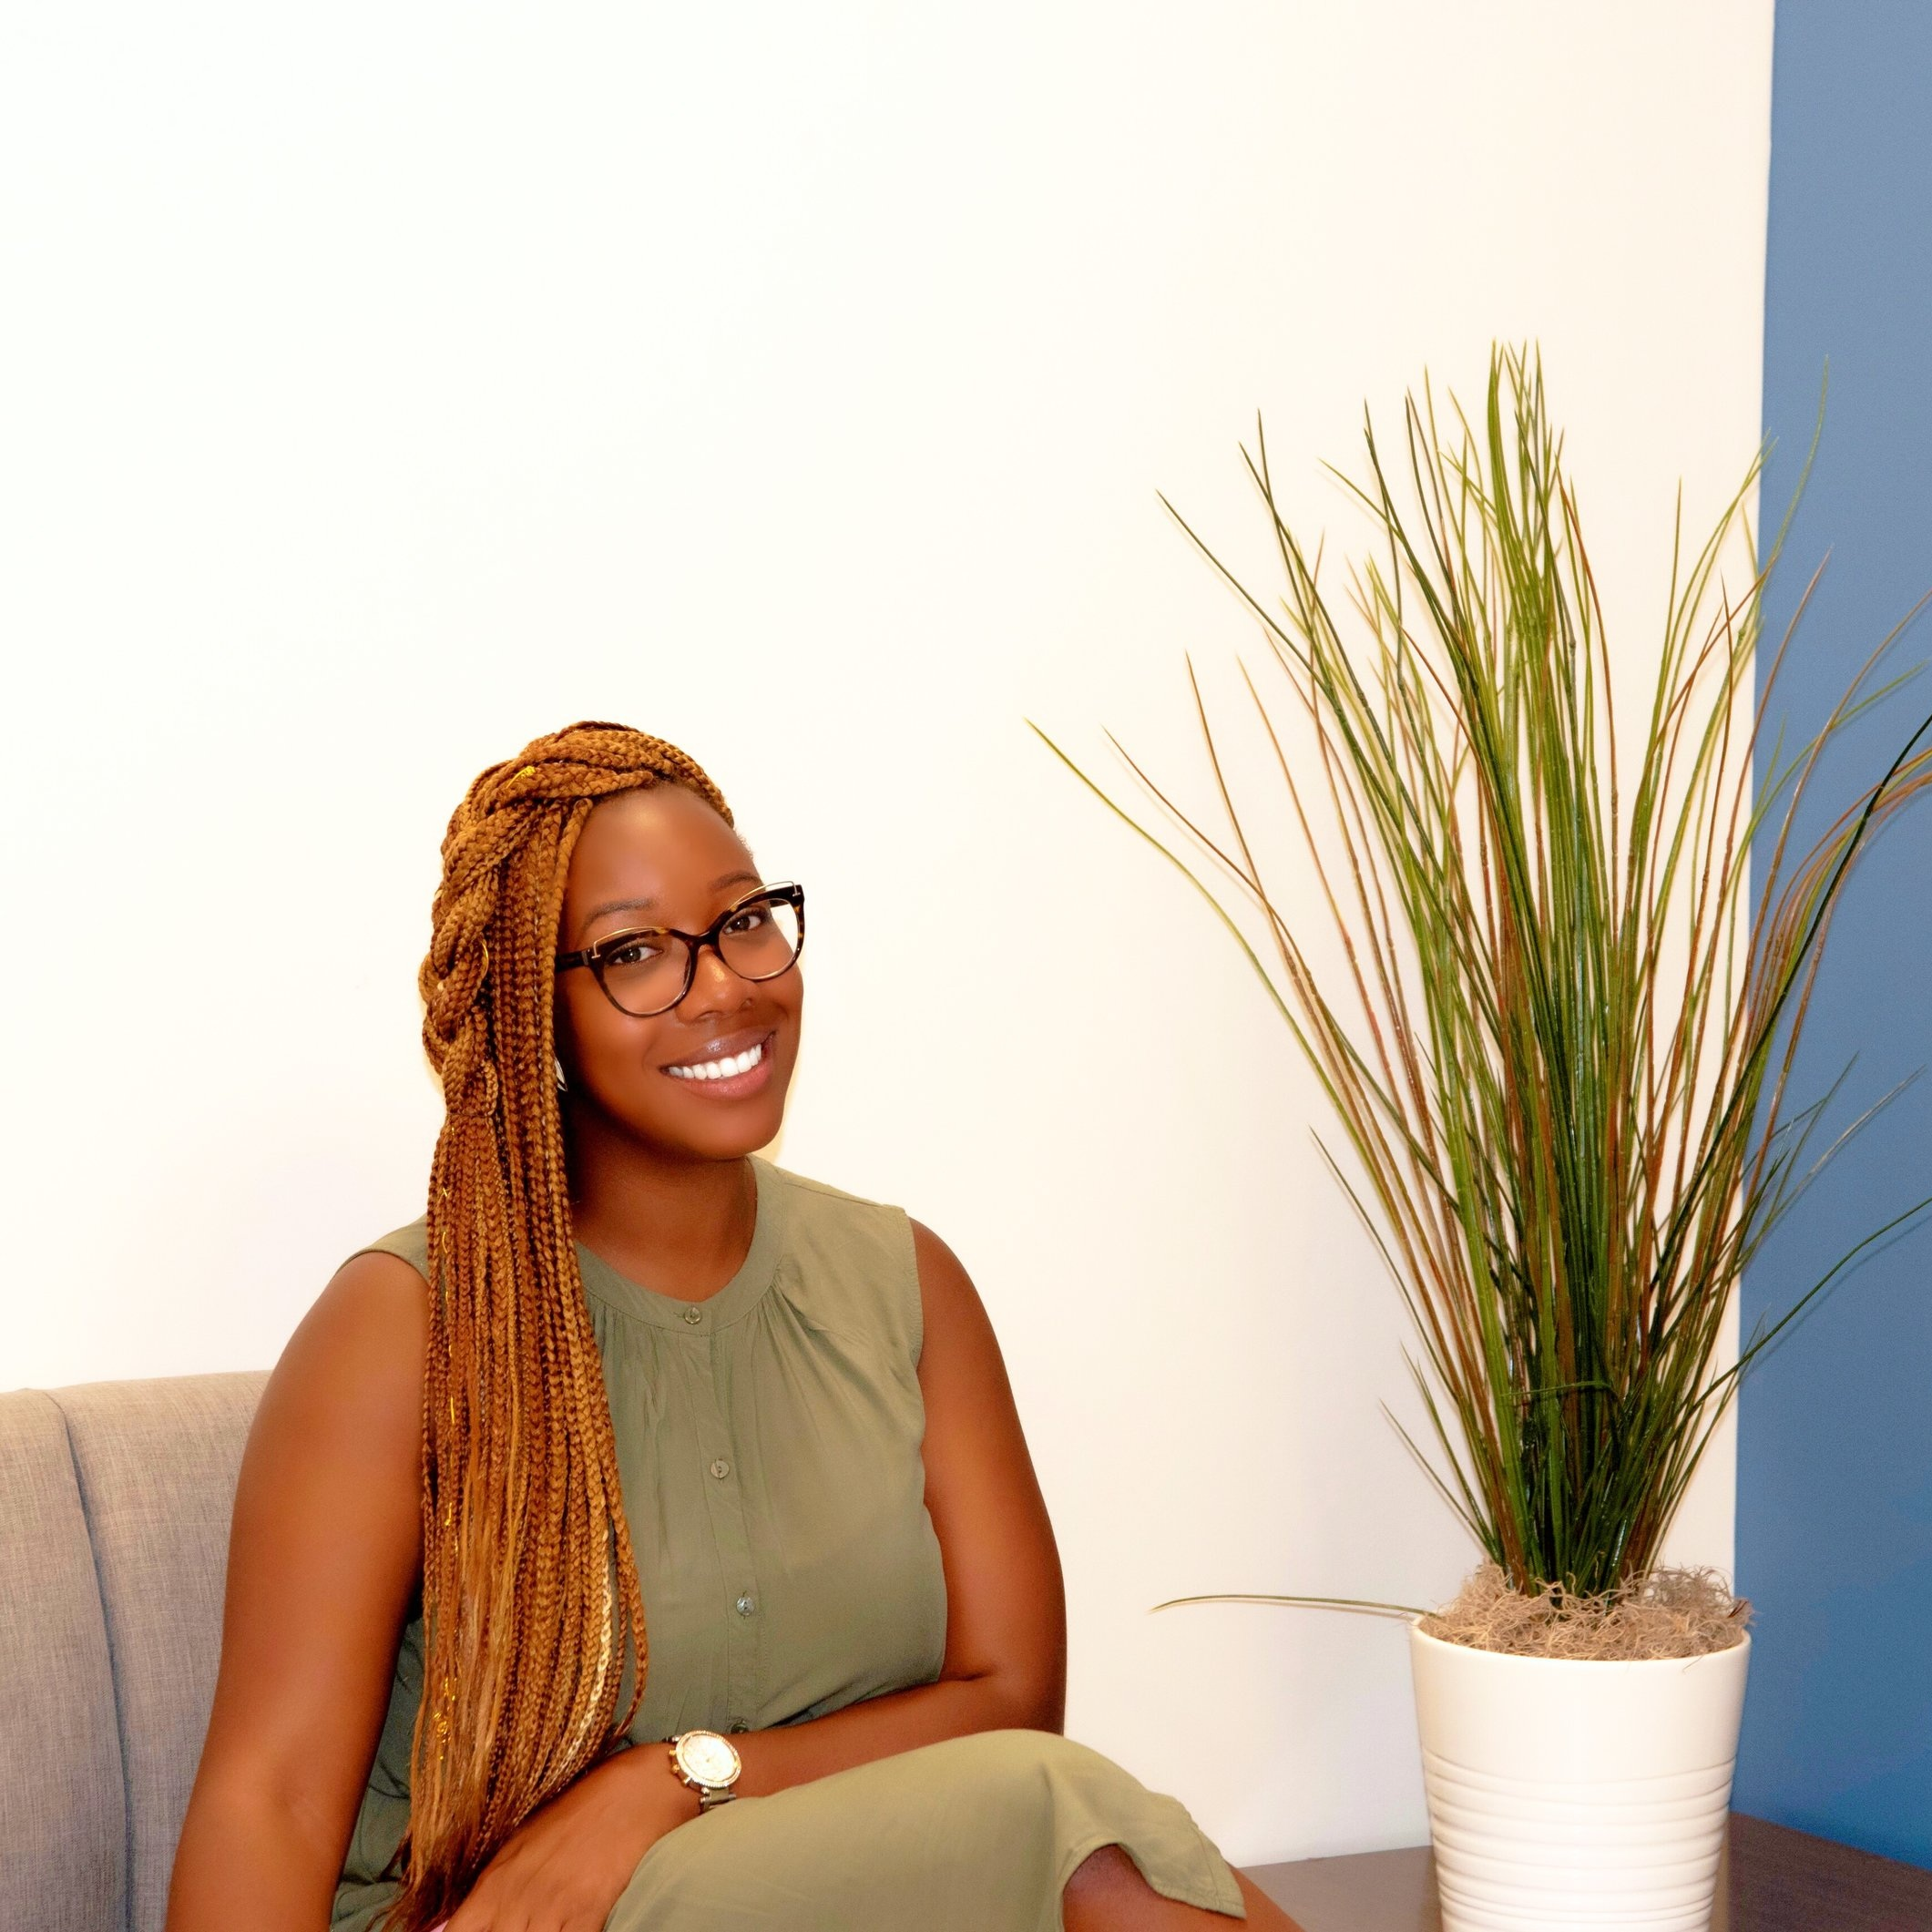 Zoe Hunter - Focus areas: Community Engagement, Nonprofits, Social Entrepreneurship, Wellness